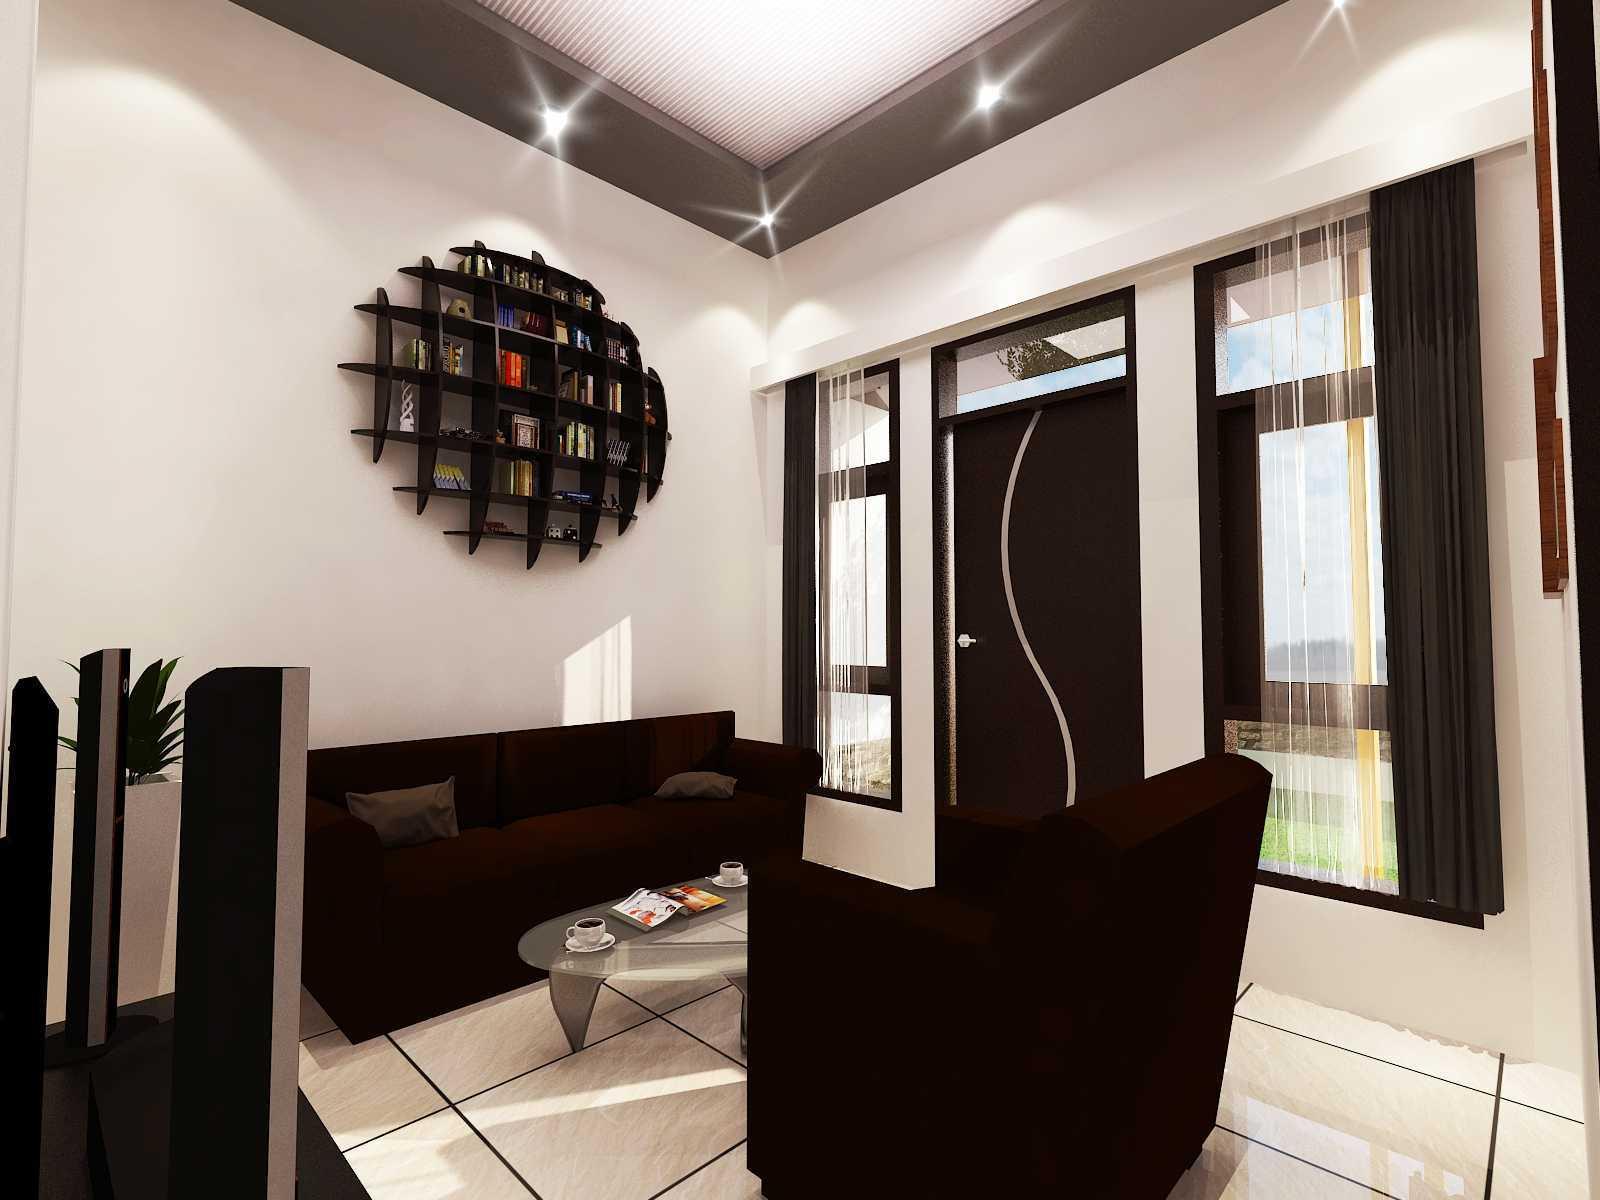 Archdesignbuild7 Rumah Tipe 36 Di Jatihandap Jatihandap, Bandung Jatihandap, Bandung Guest Room Minimalis  20127